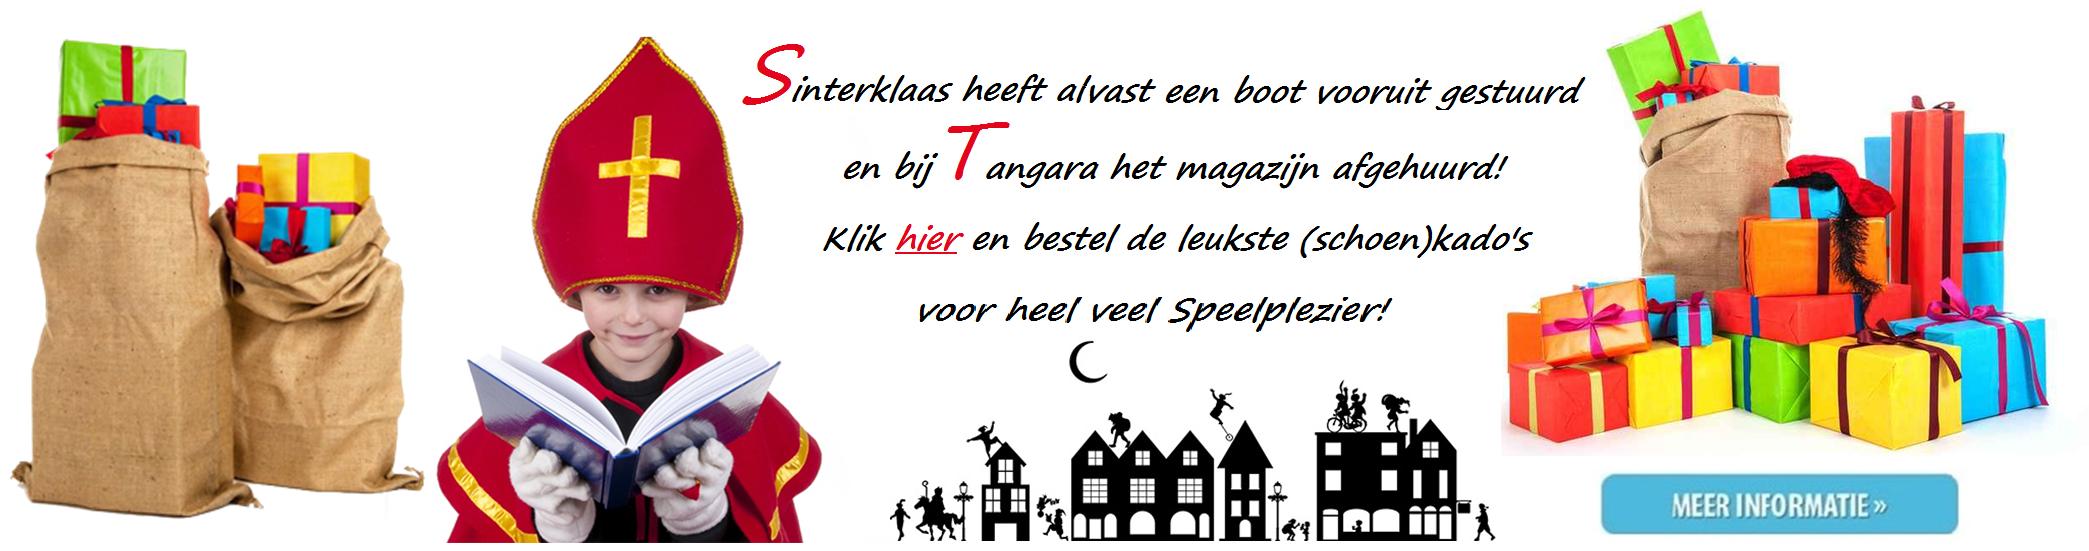 Sinterklaas kado